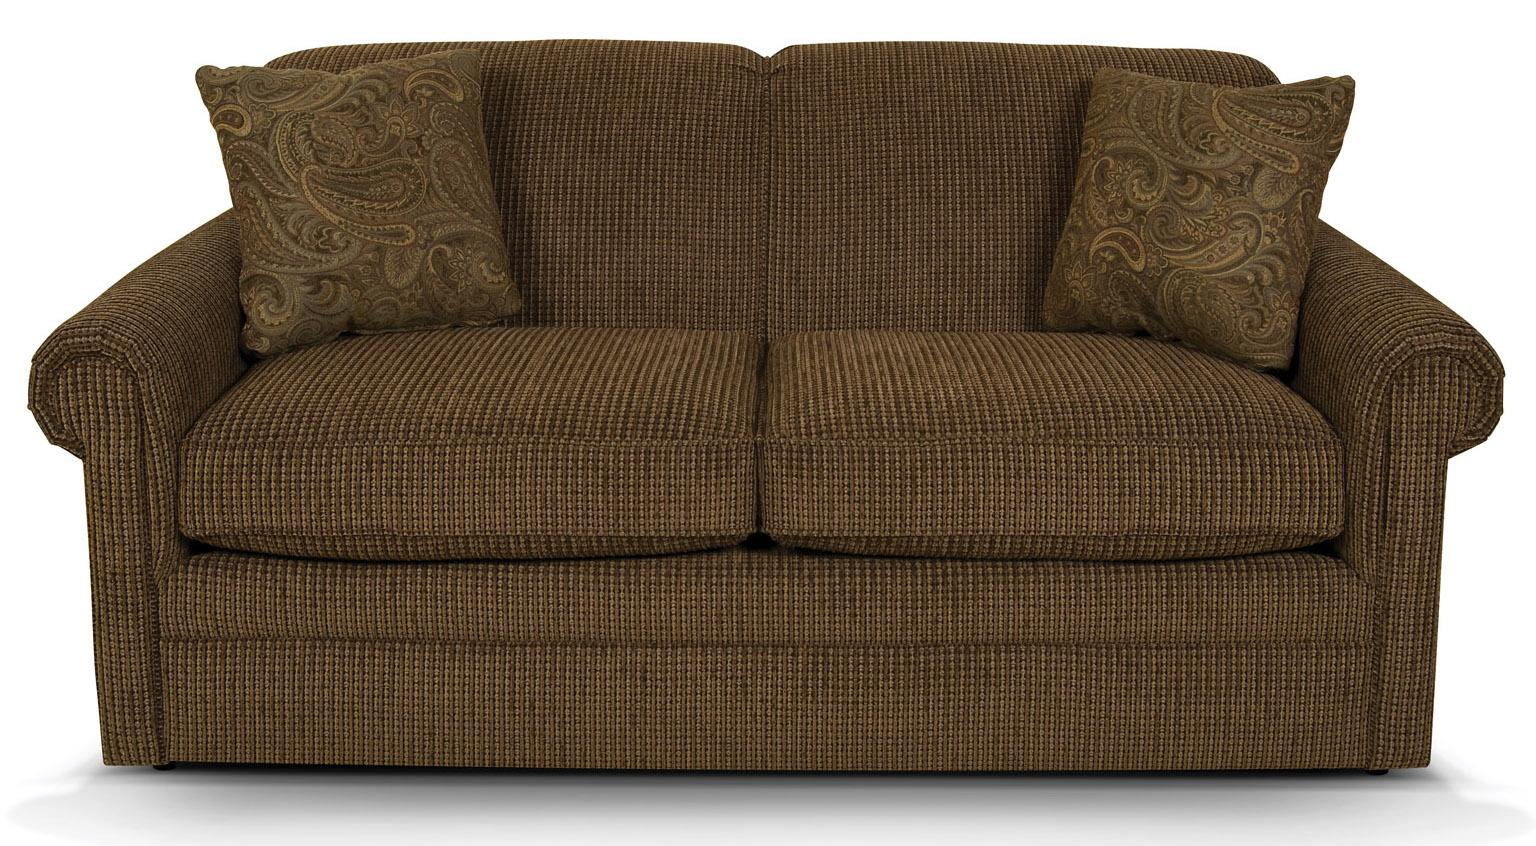 England Savona Love Seat - Item Number: 906